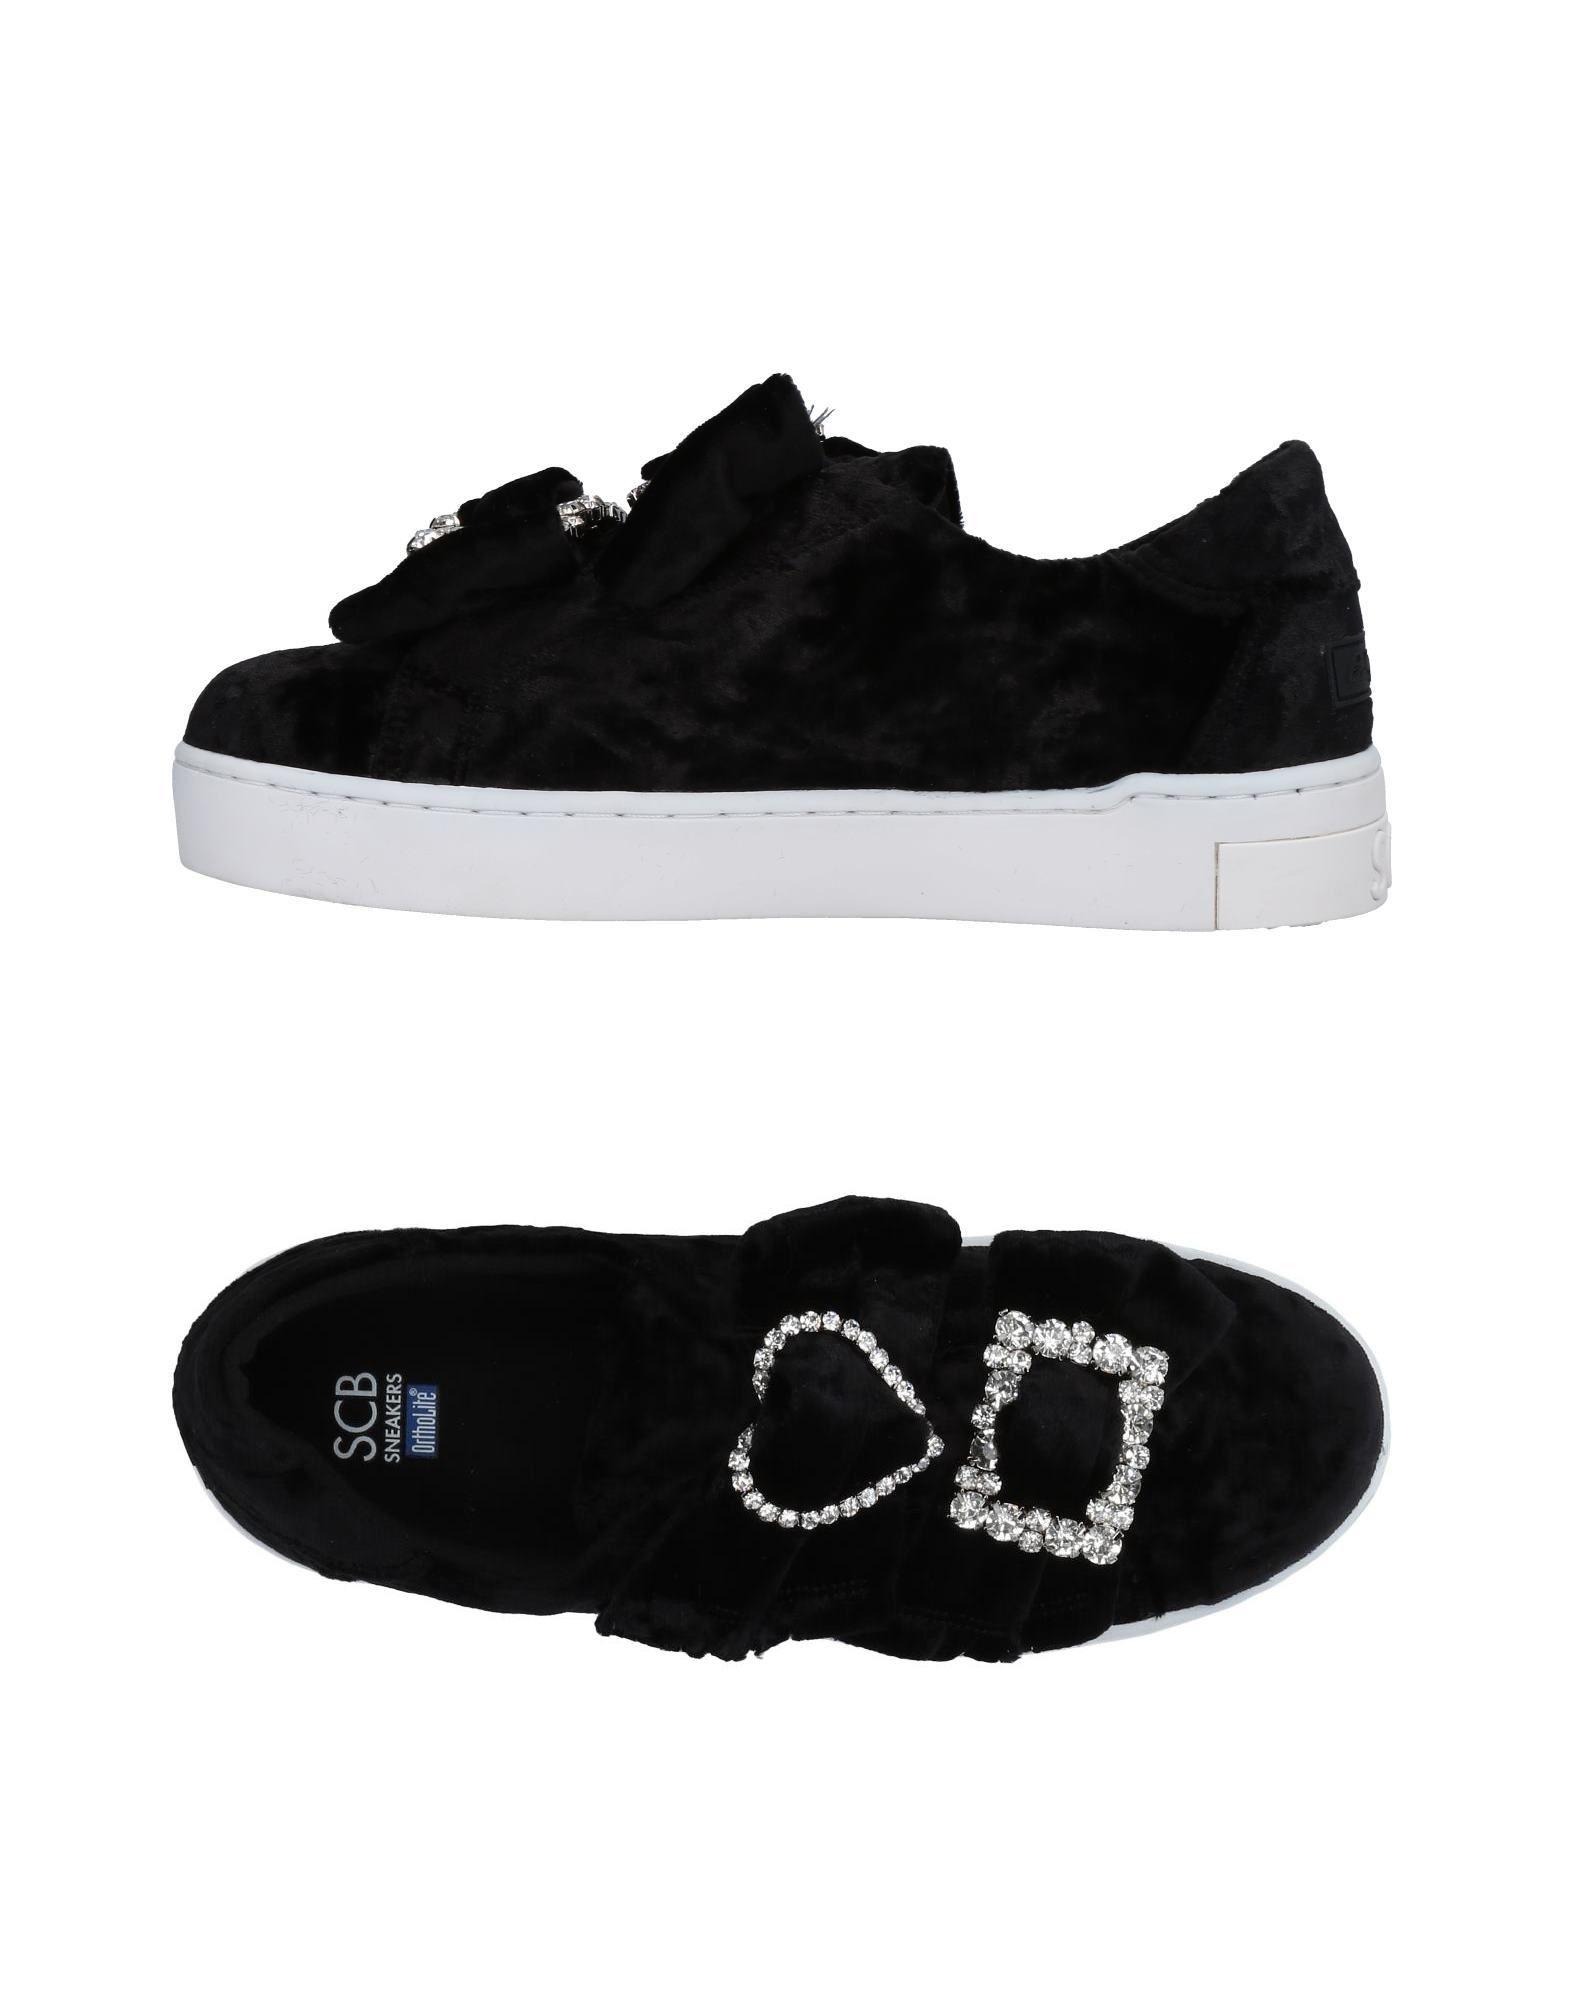 Stilvolle Stilvolle Stilvolle billige Schuhe Suecomma Bonnie Sneakers Damen  11480204UC 9e4b3d